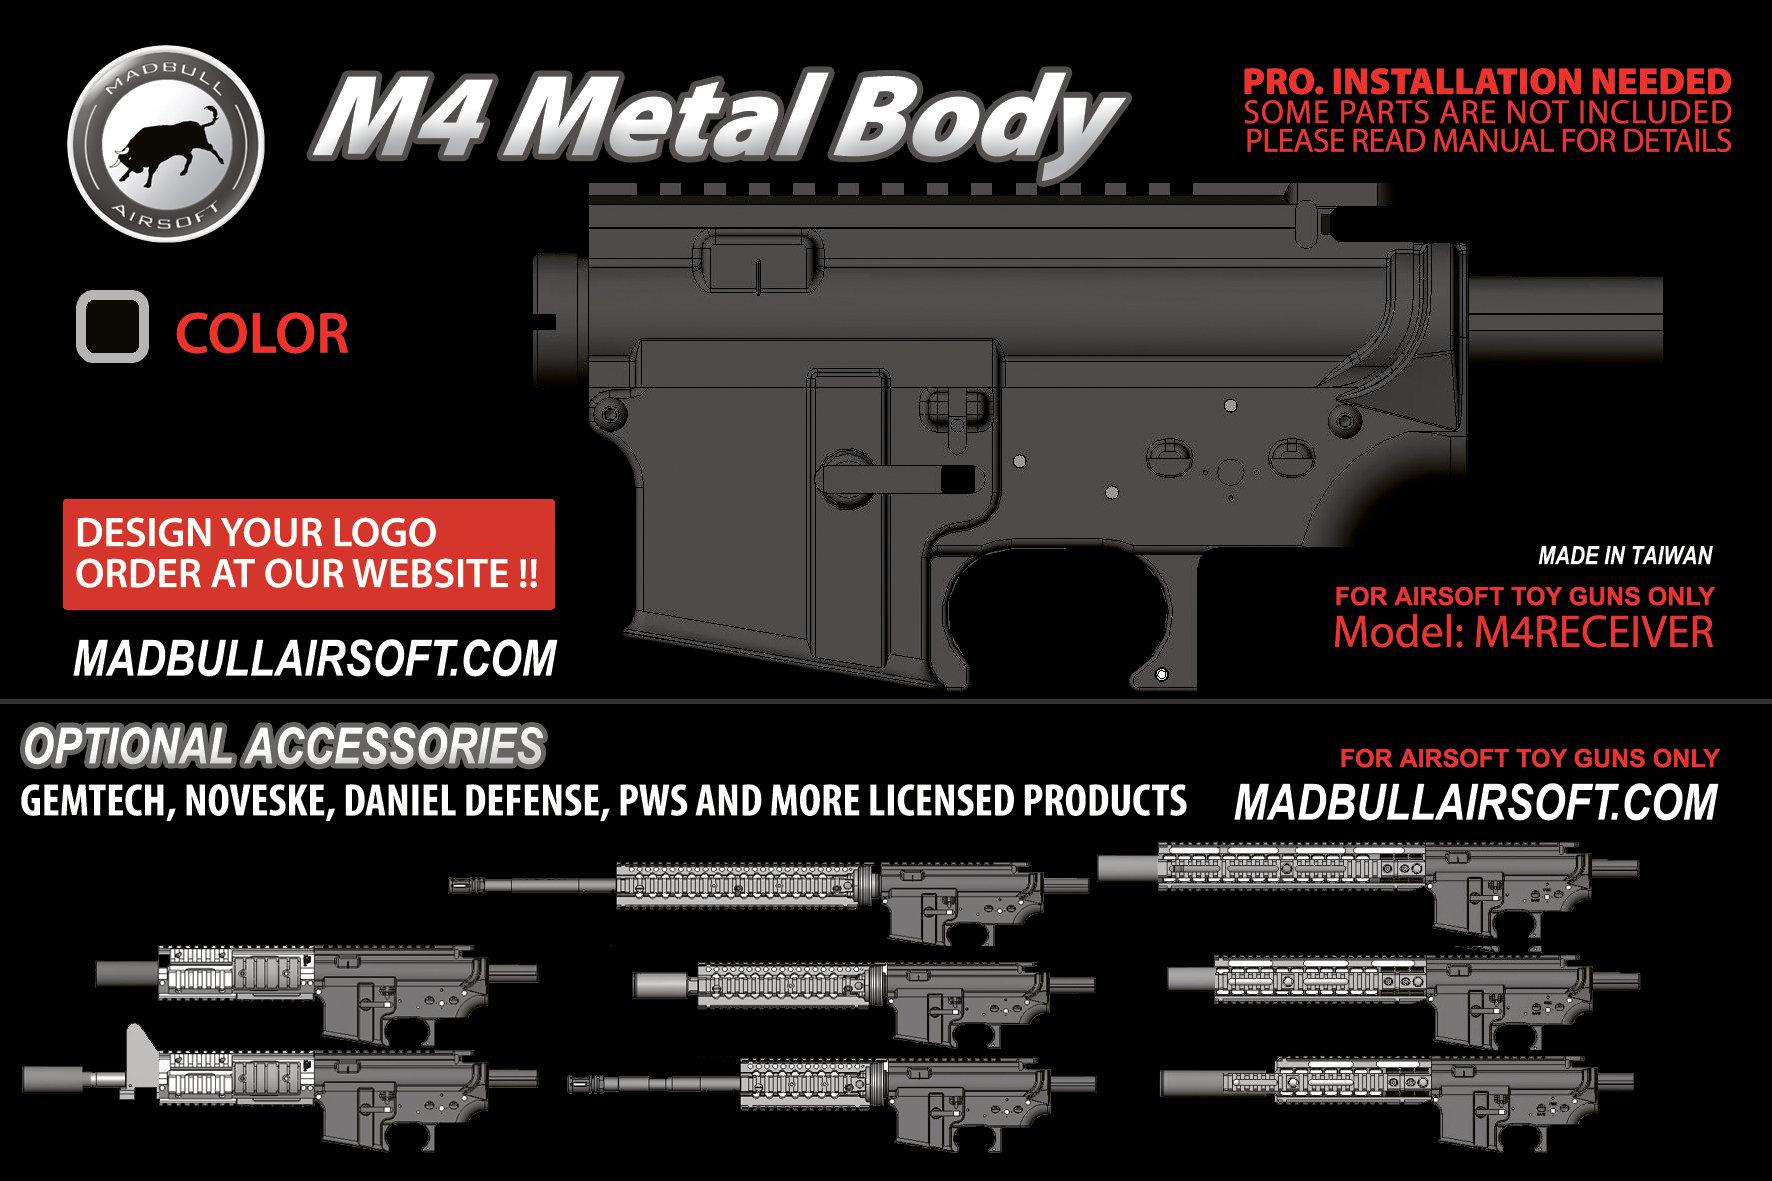 M4 Body